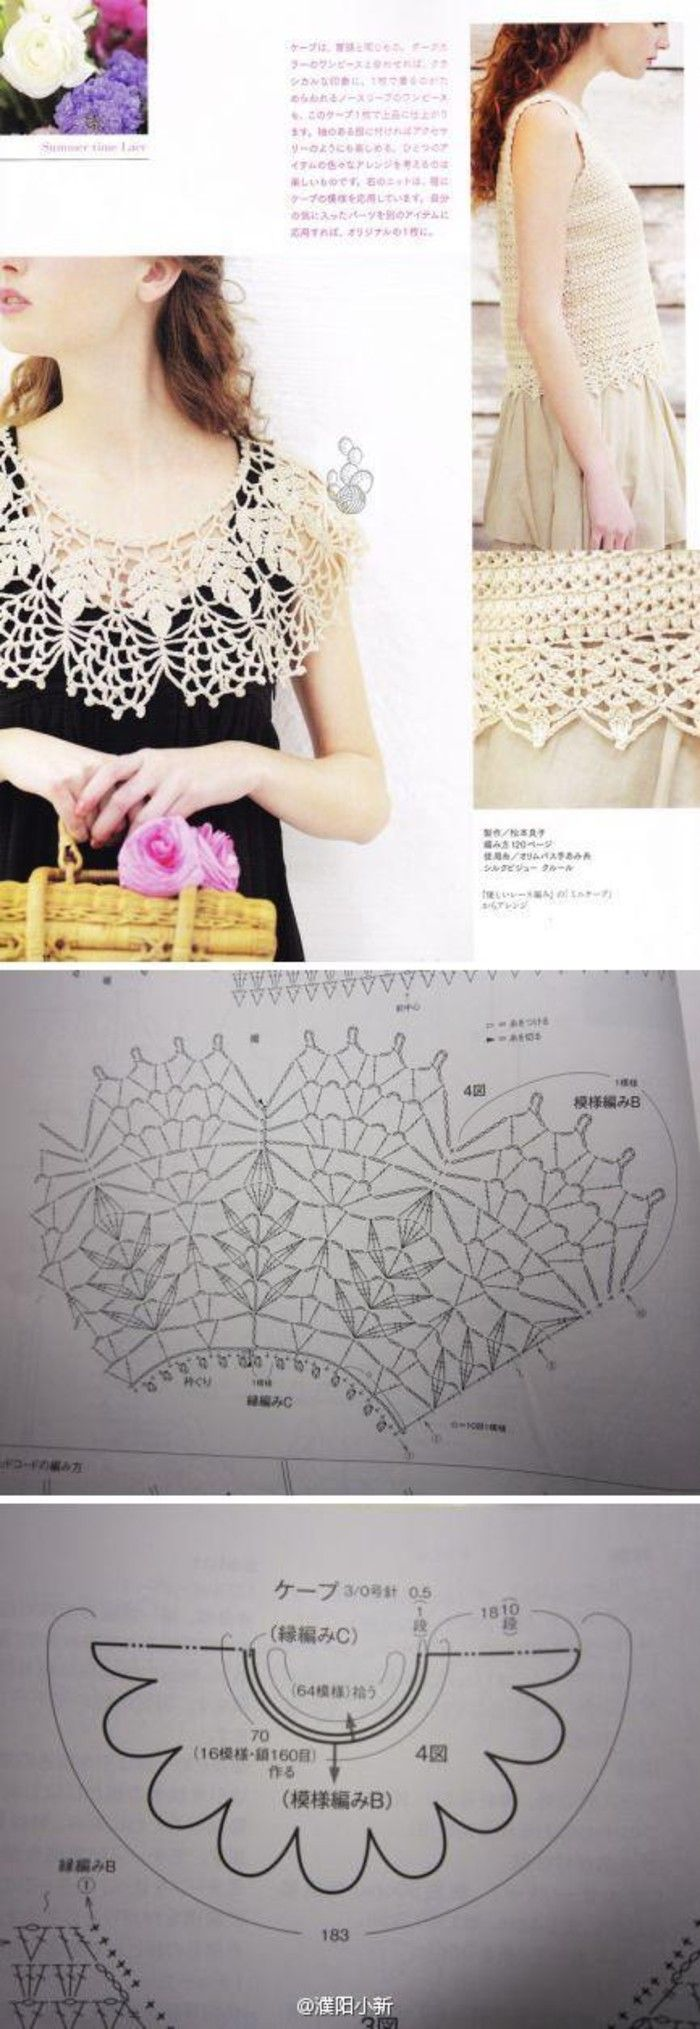 Mejores 21 imágenes de crochet en Pinterest   Abrigo de ganchillo ...